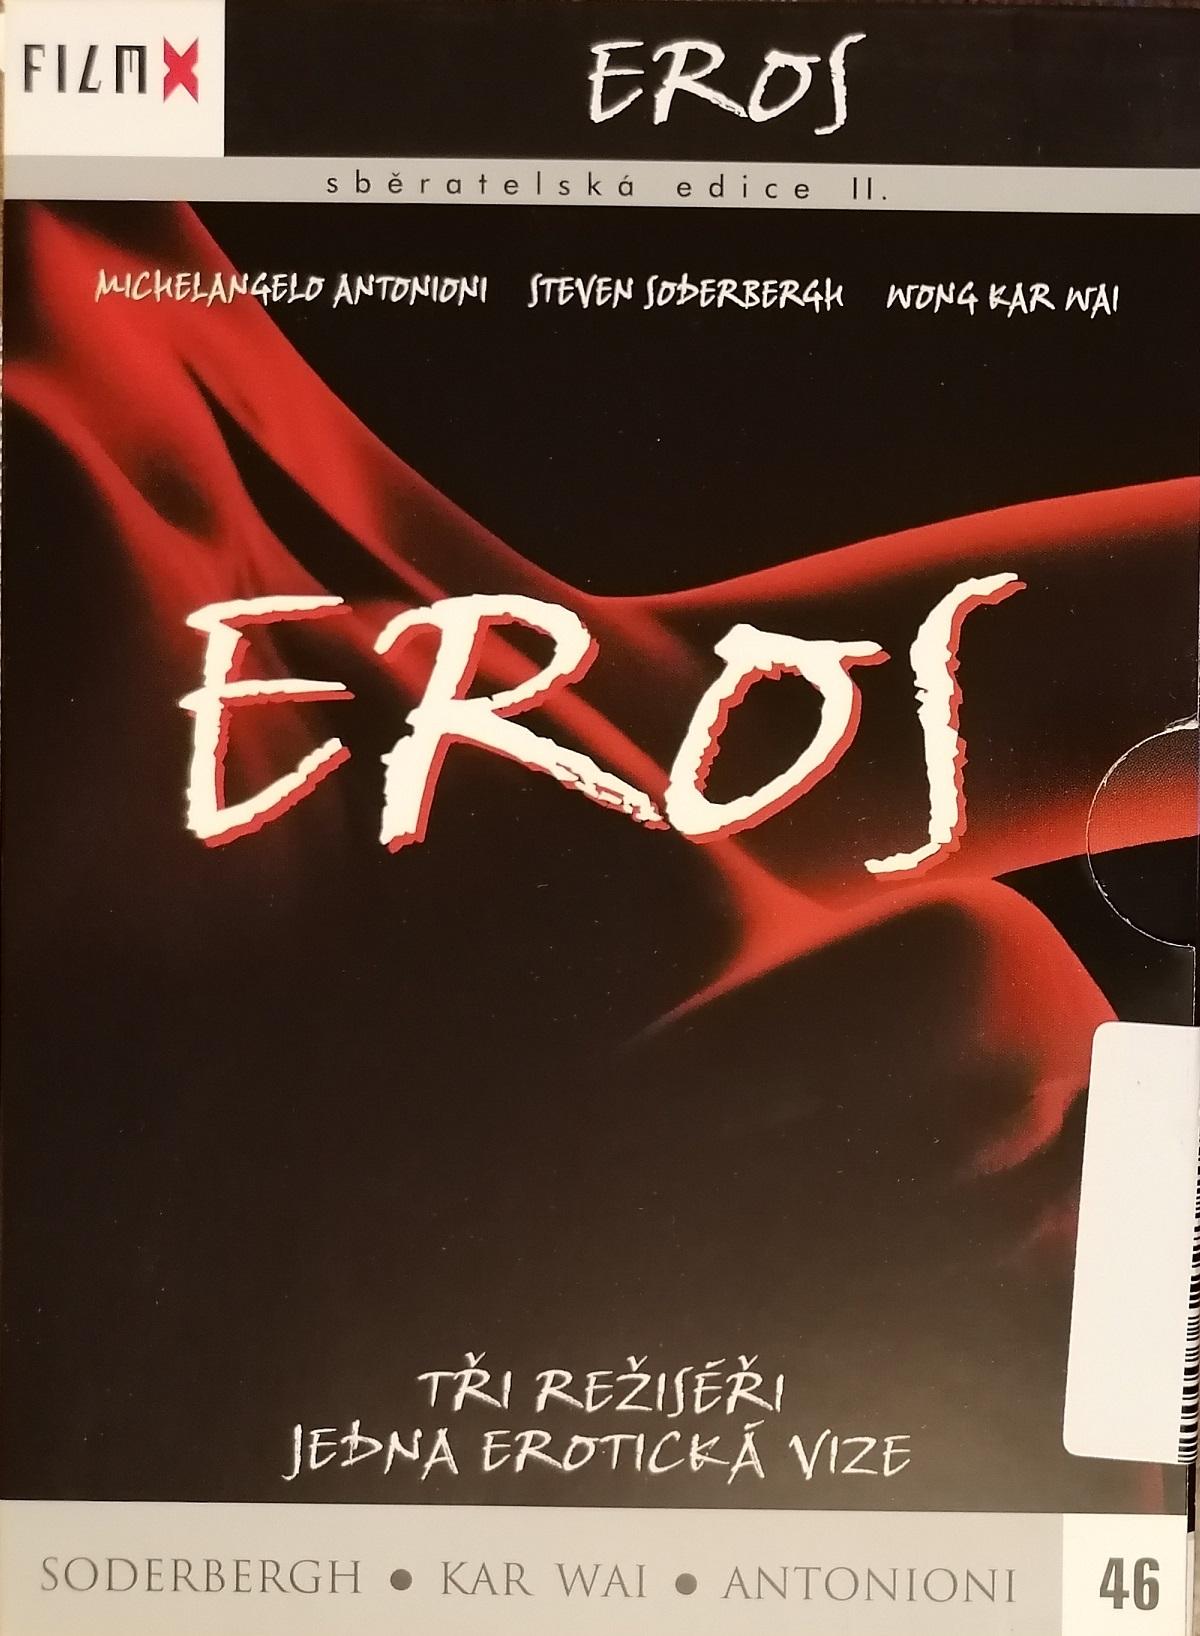 Eros - DVD digipack